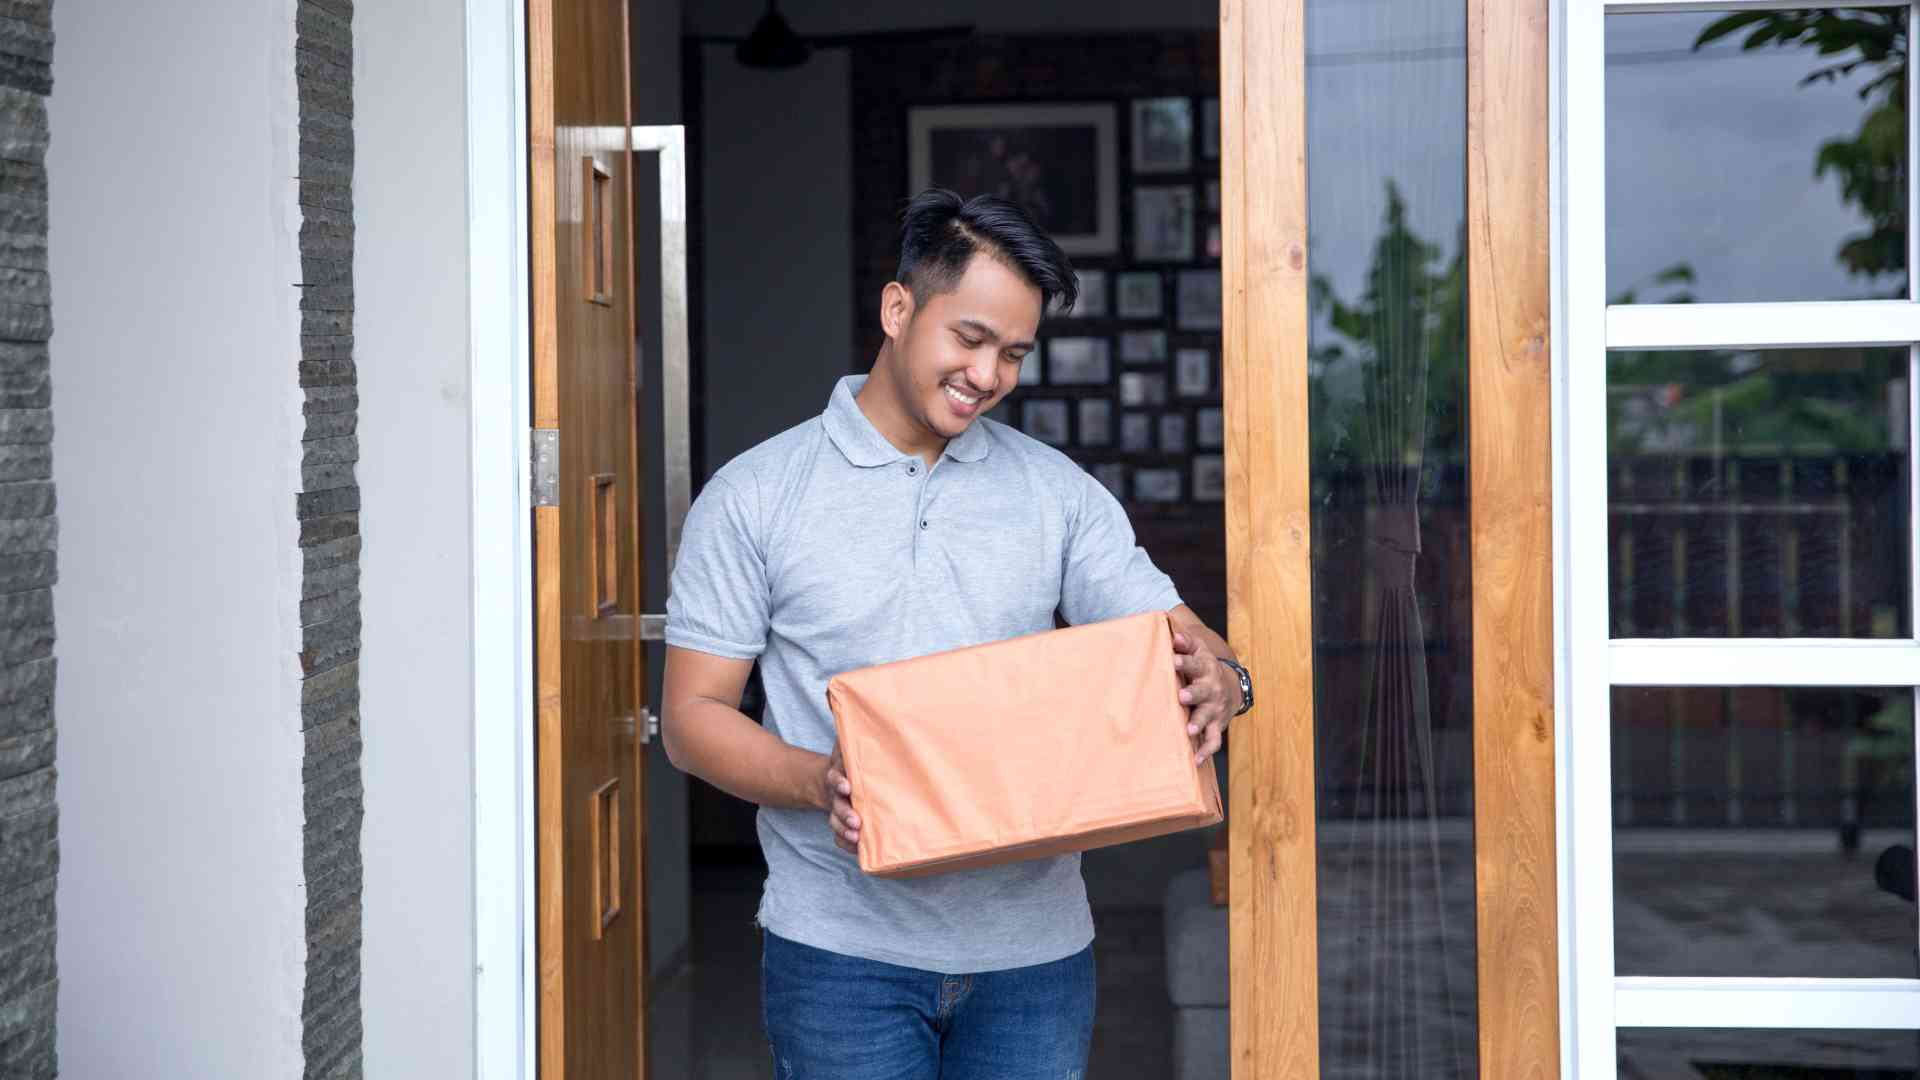 POS Package at Door